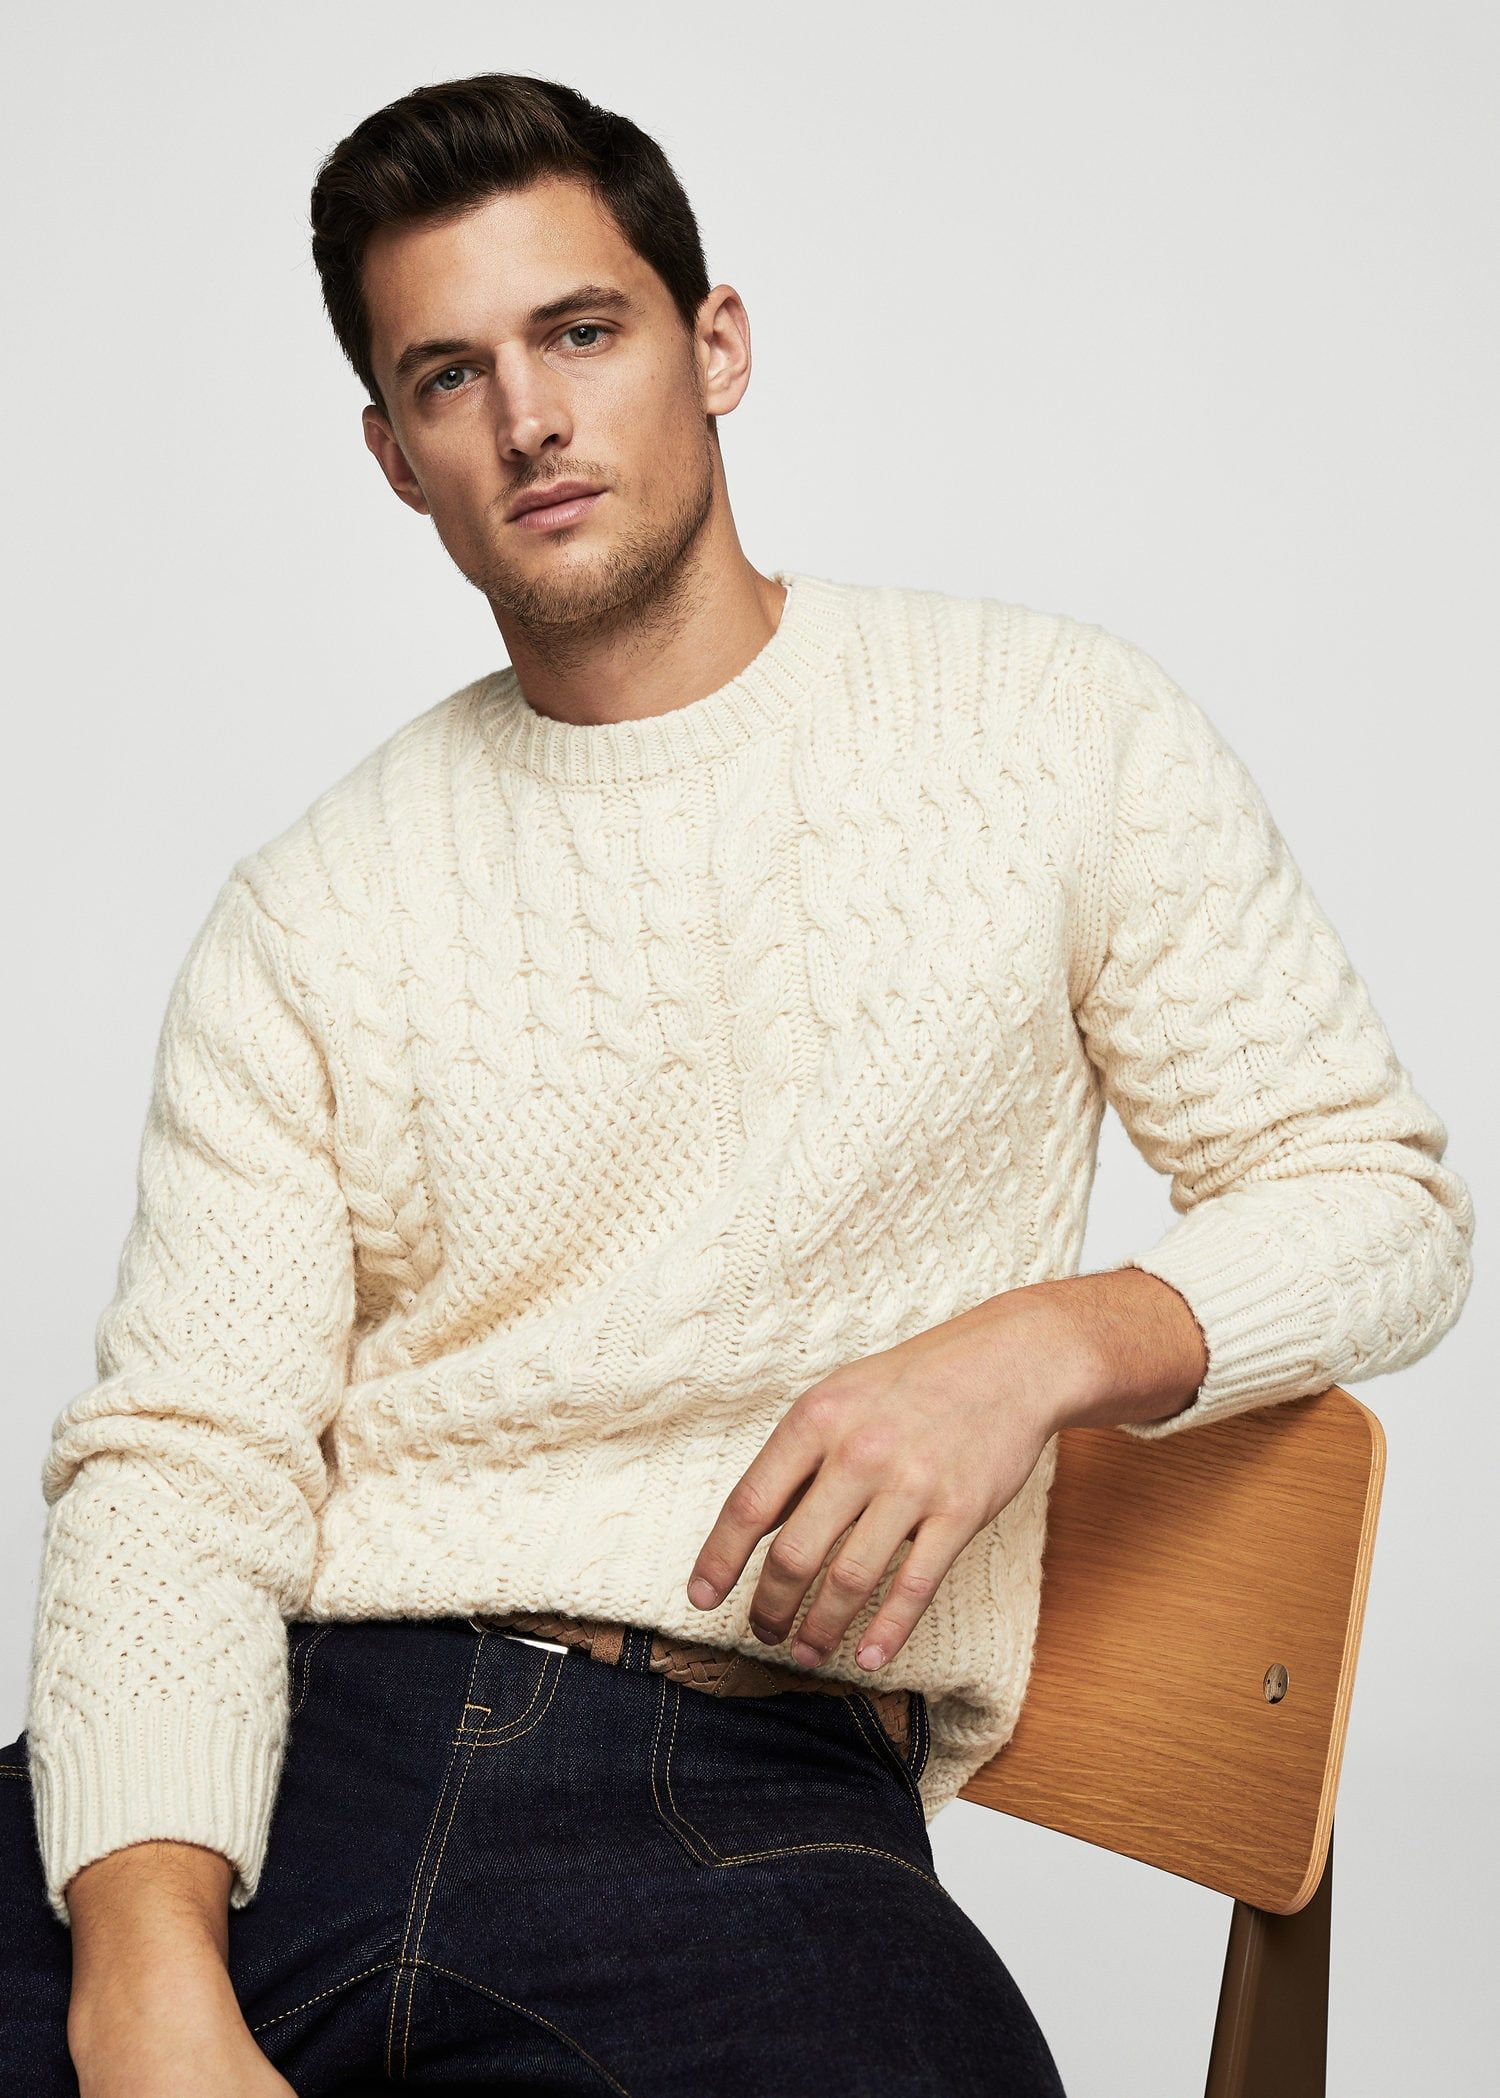 Jersey lana ochos - Hombre | Tricot | Pinterest | Lana, Mangas ...